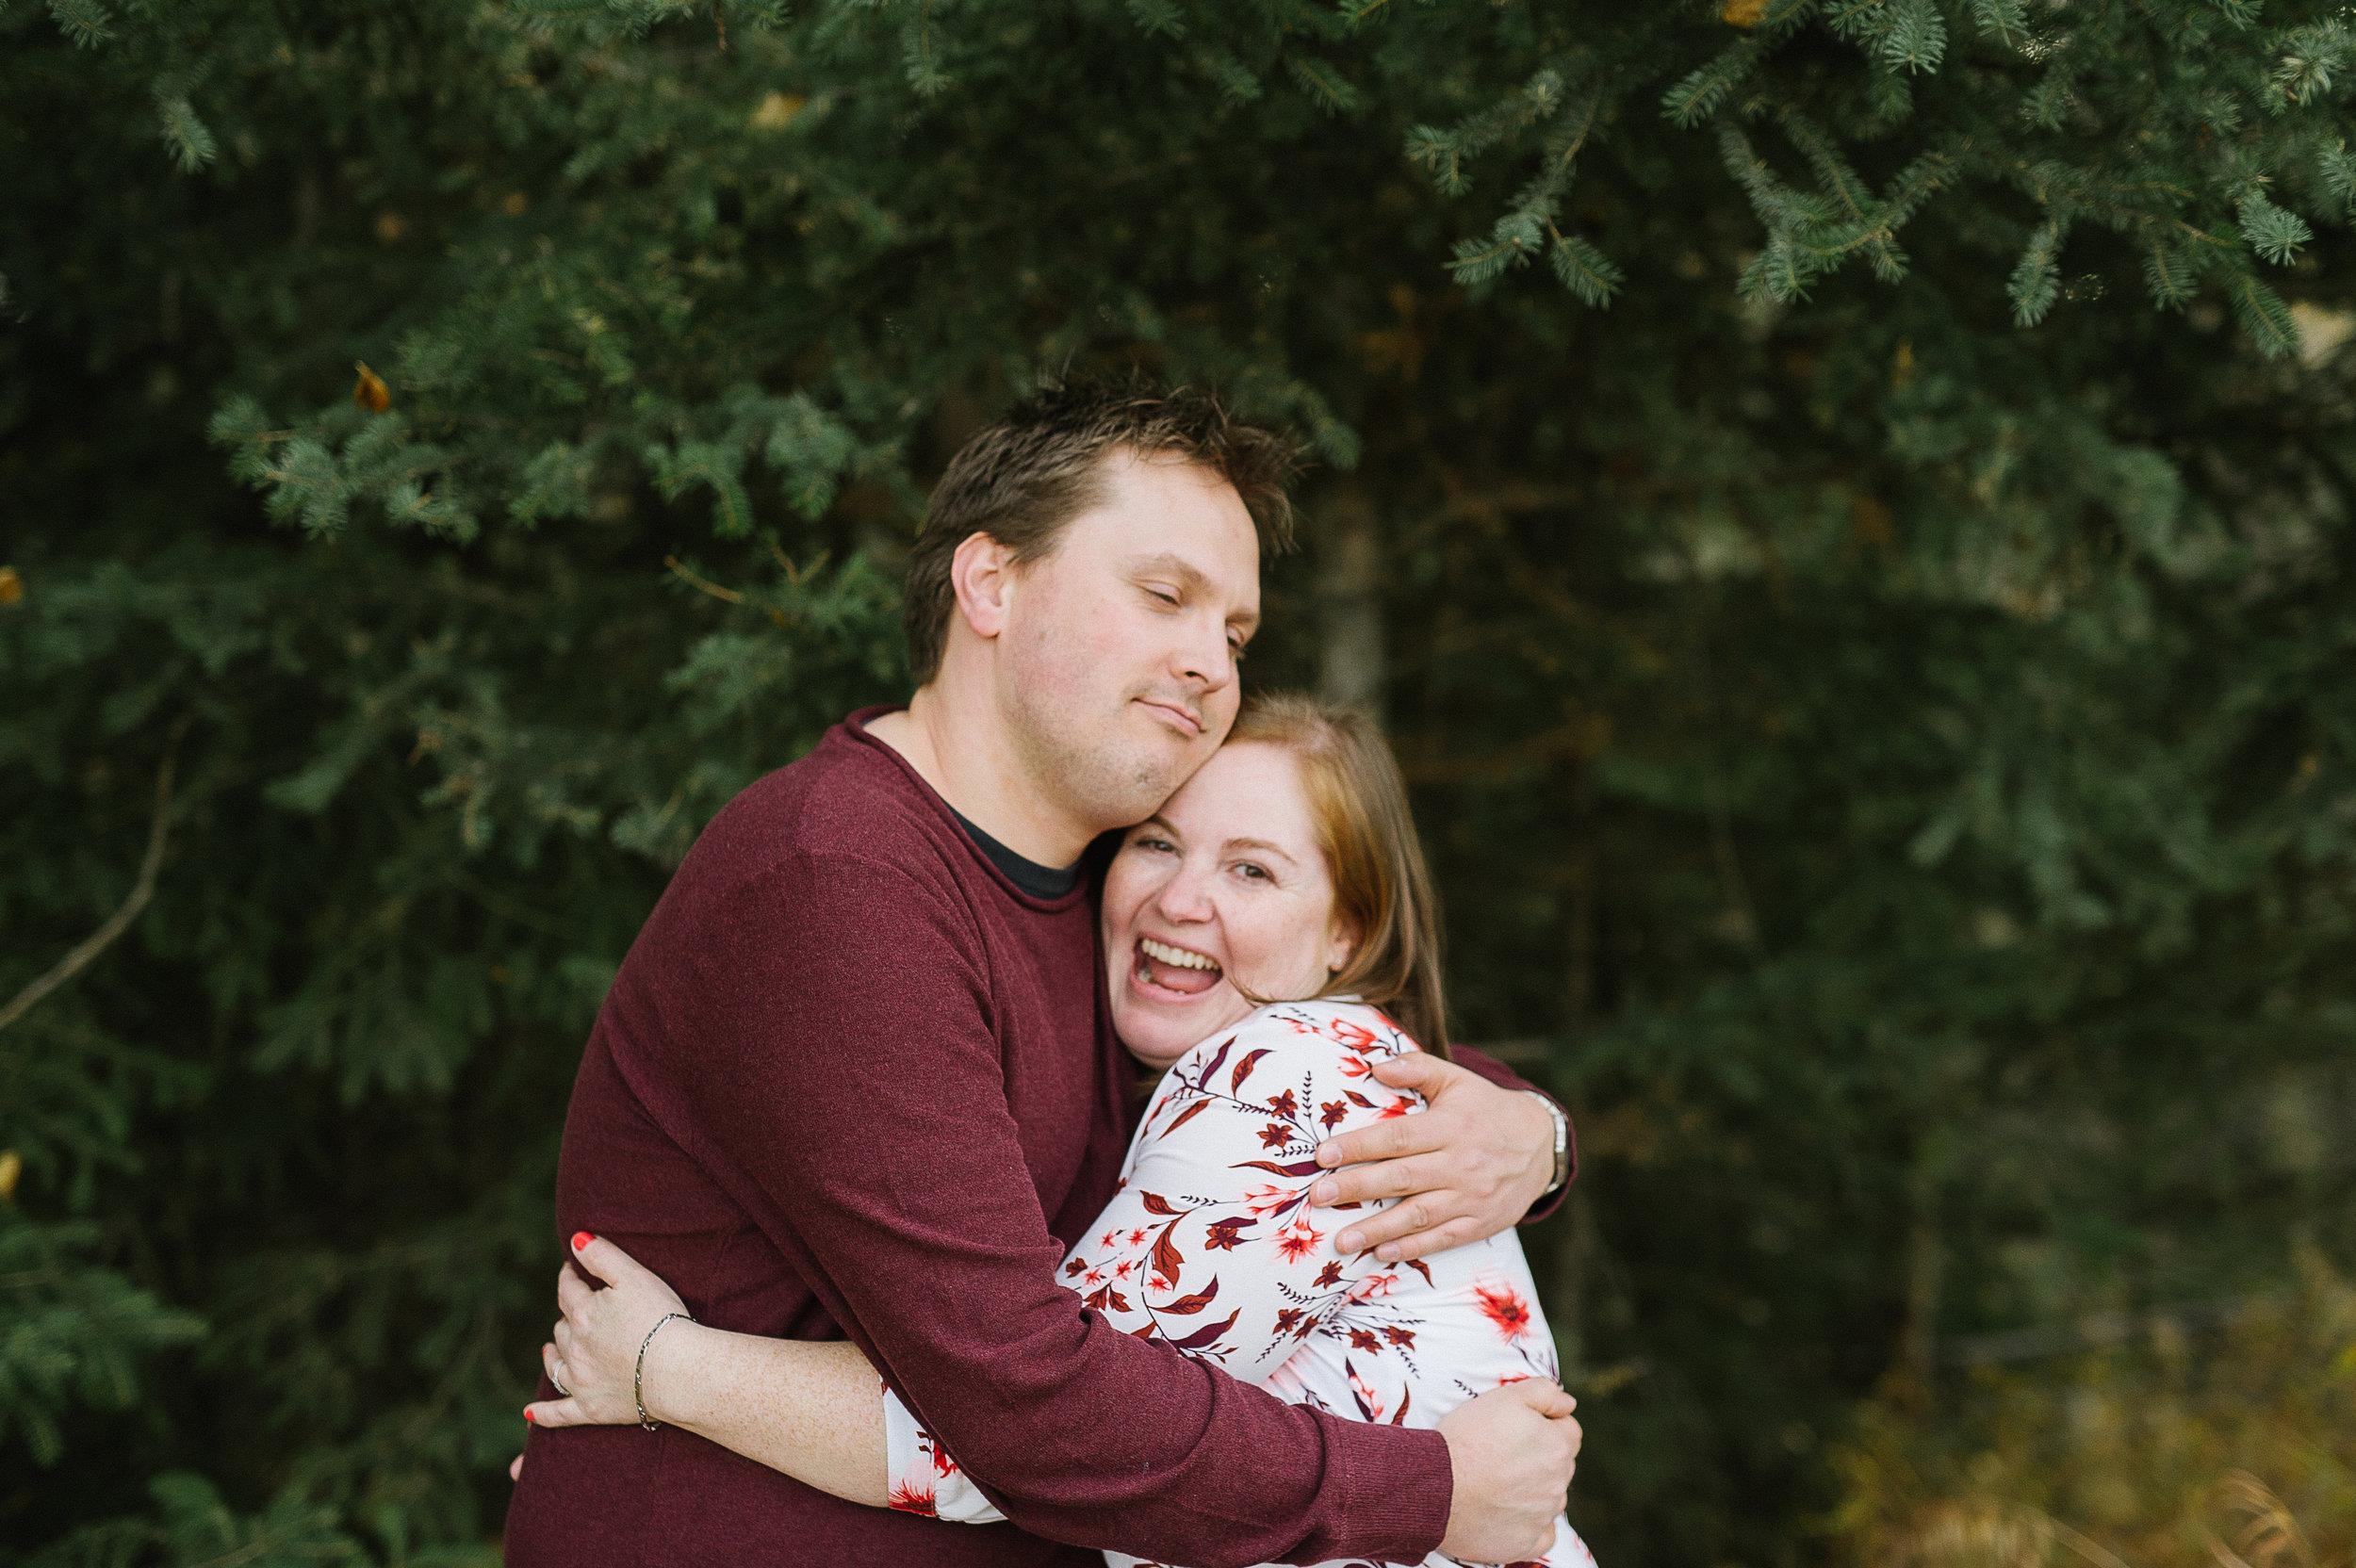 Calgary_Wedding_Photography_Amanada_Marc_Engagements_2017_HR 0027.jpg